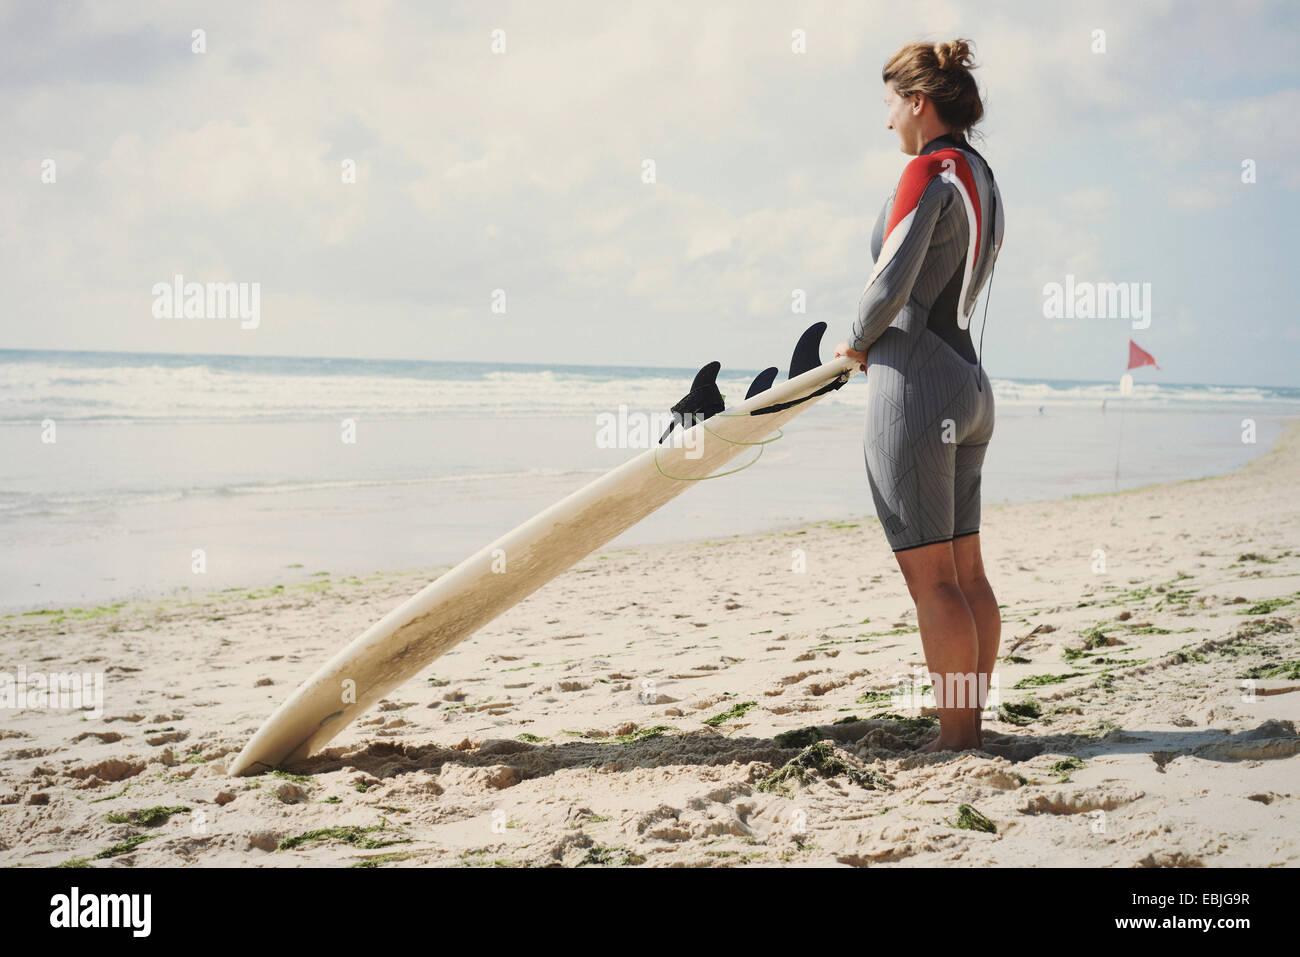 Surfer avec surfboard on beach, Lacanau, France Photo Stock